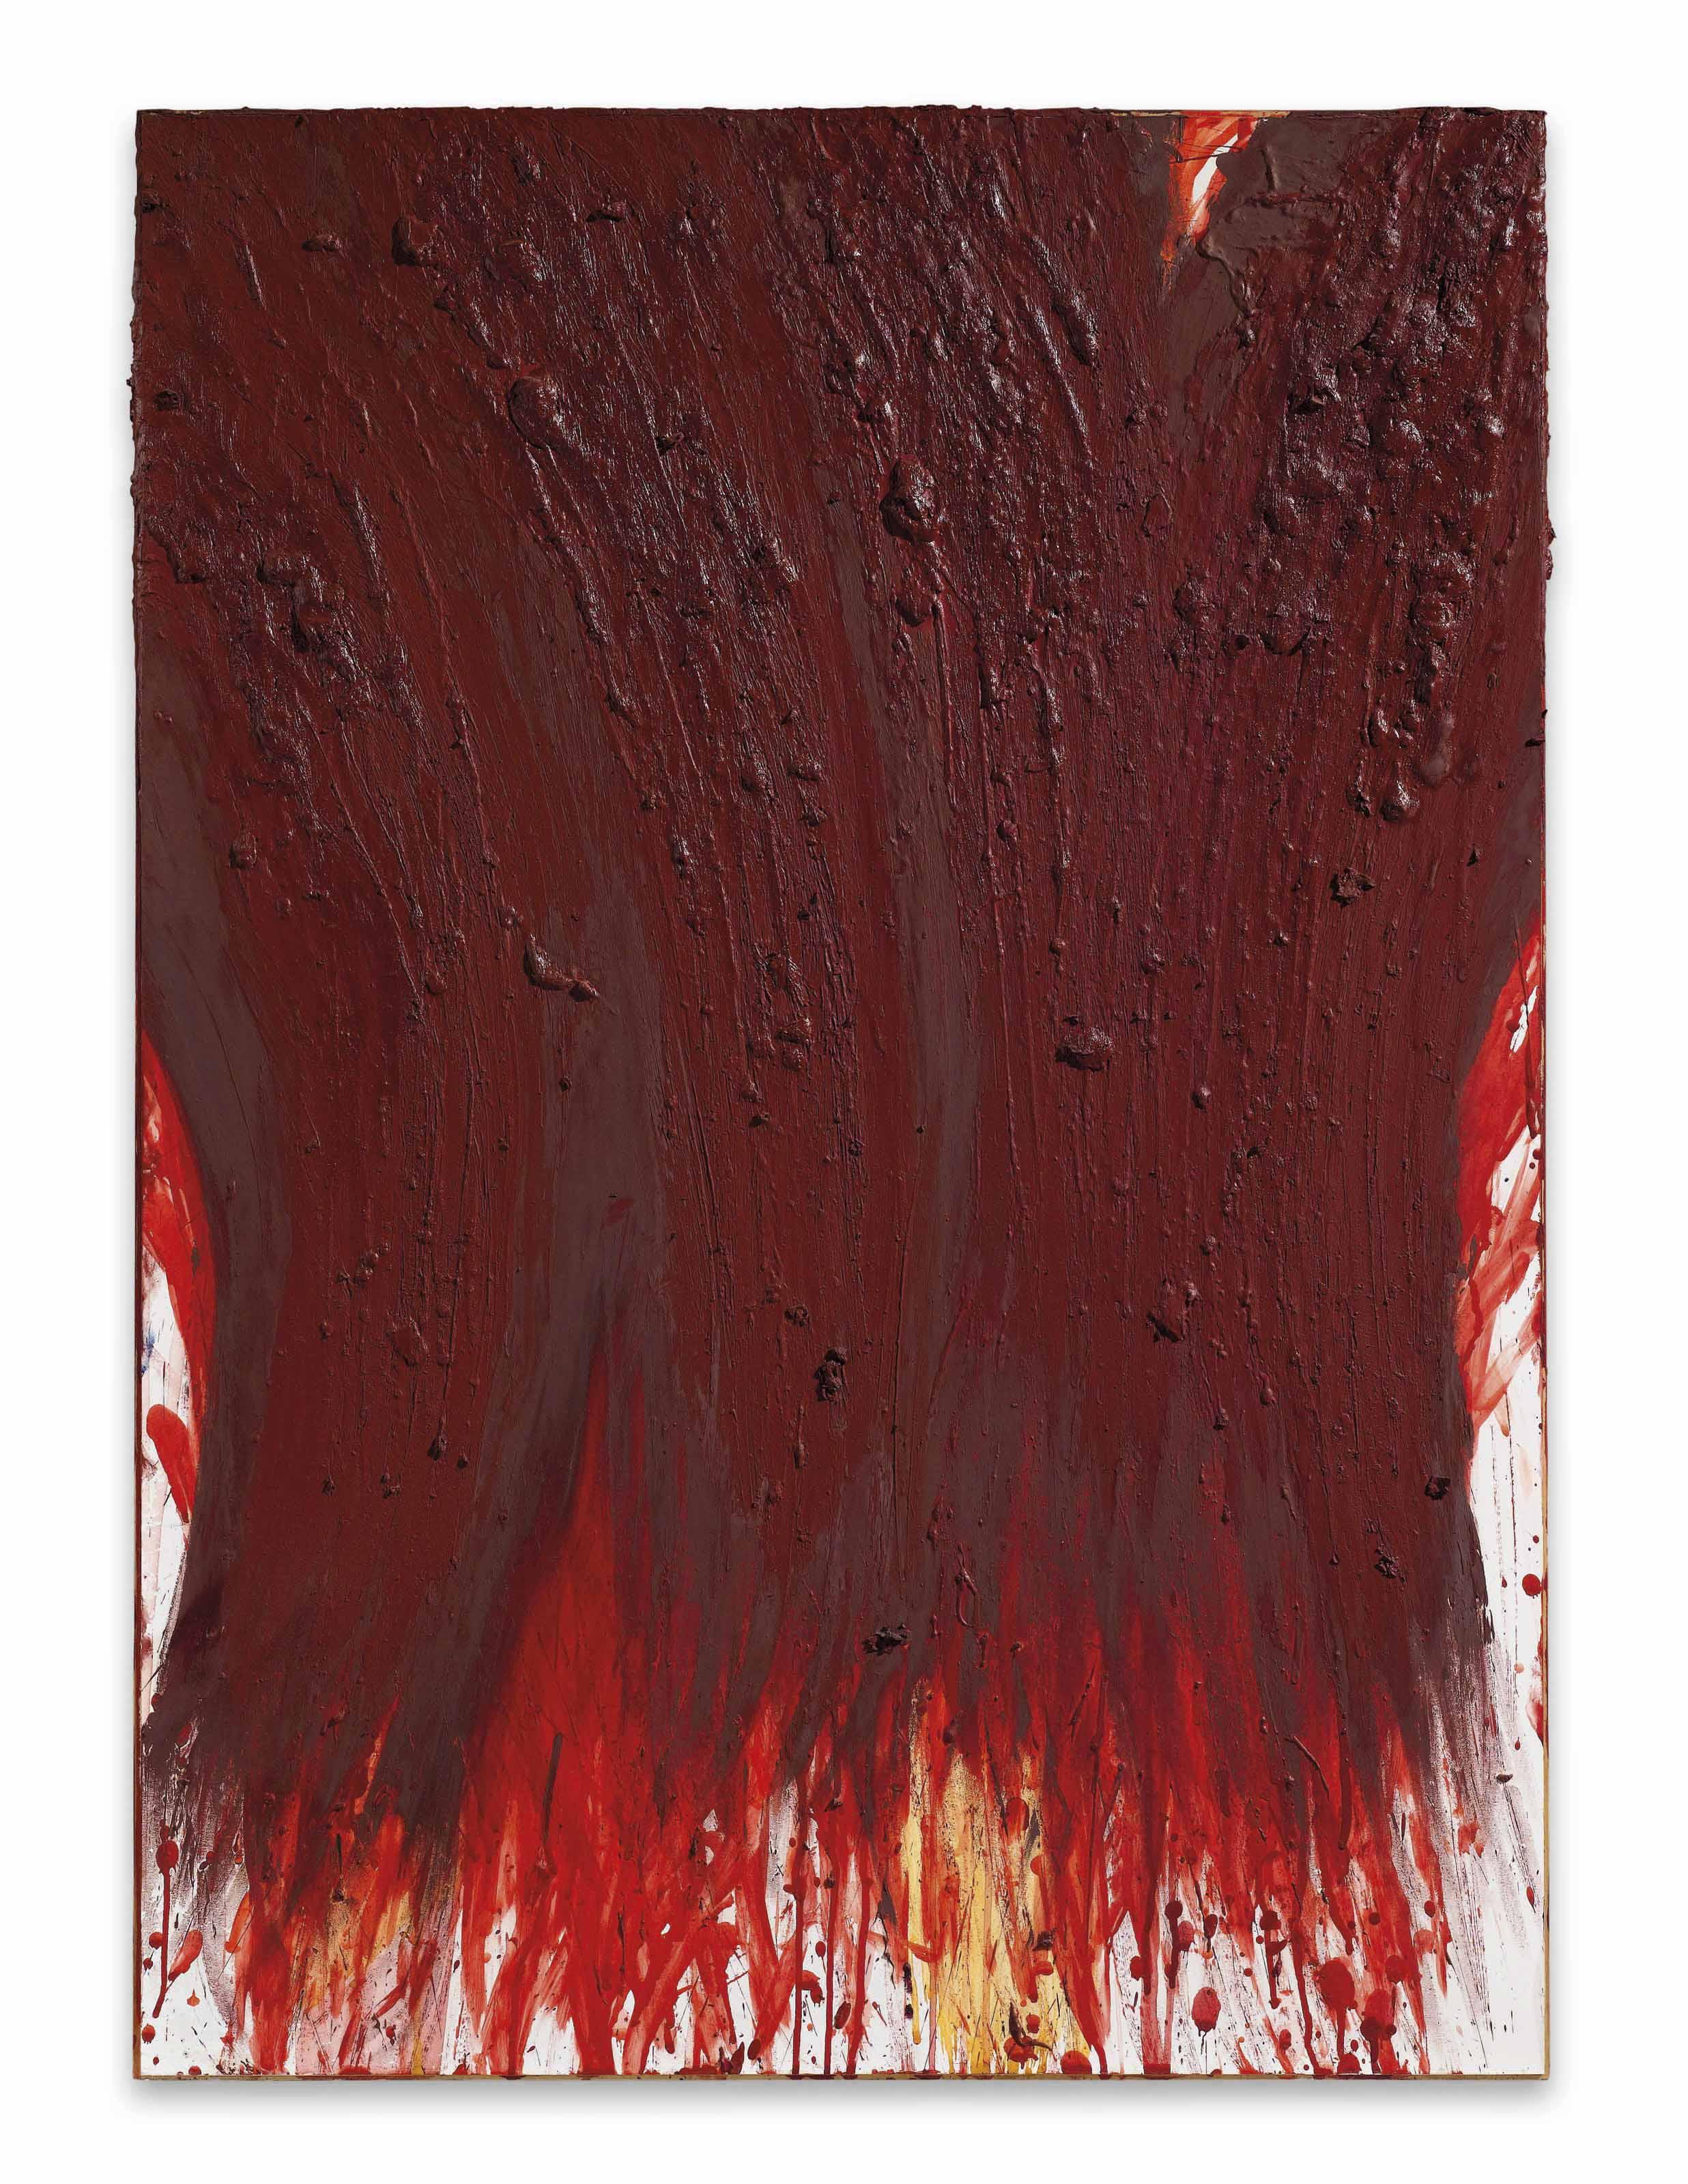 Roter Behang (Red Hanging)